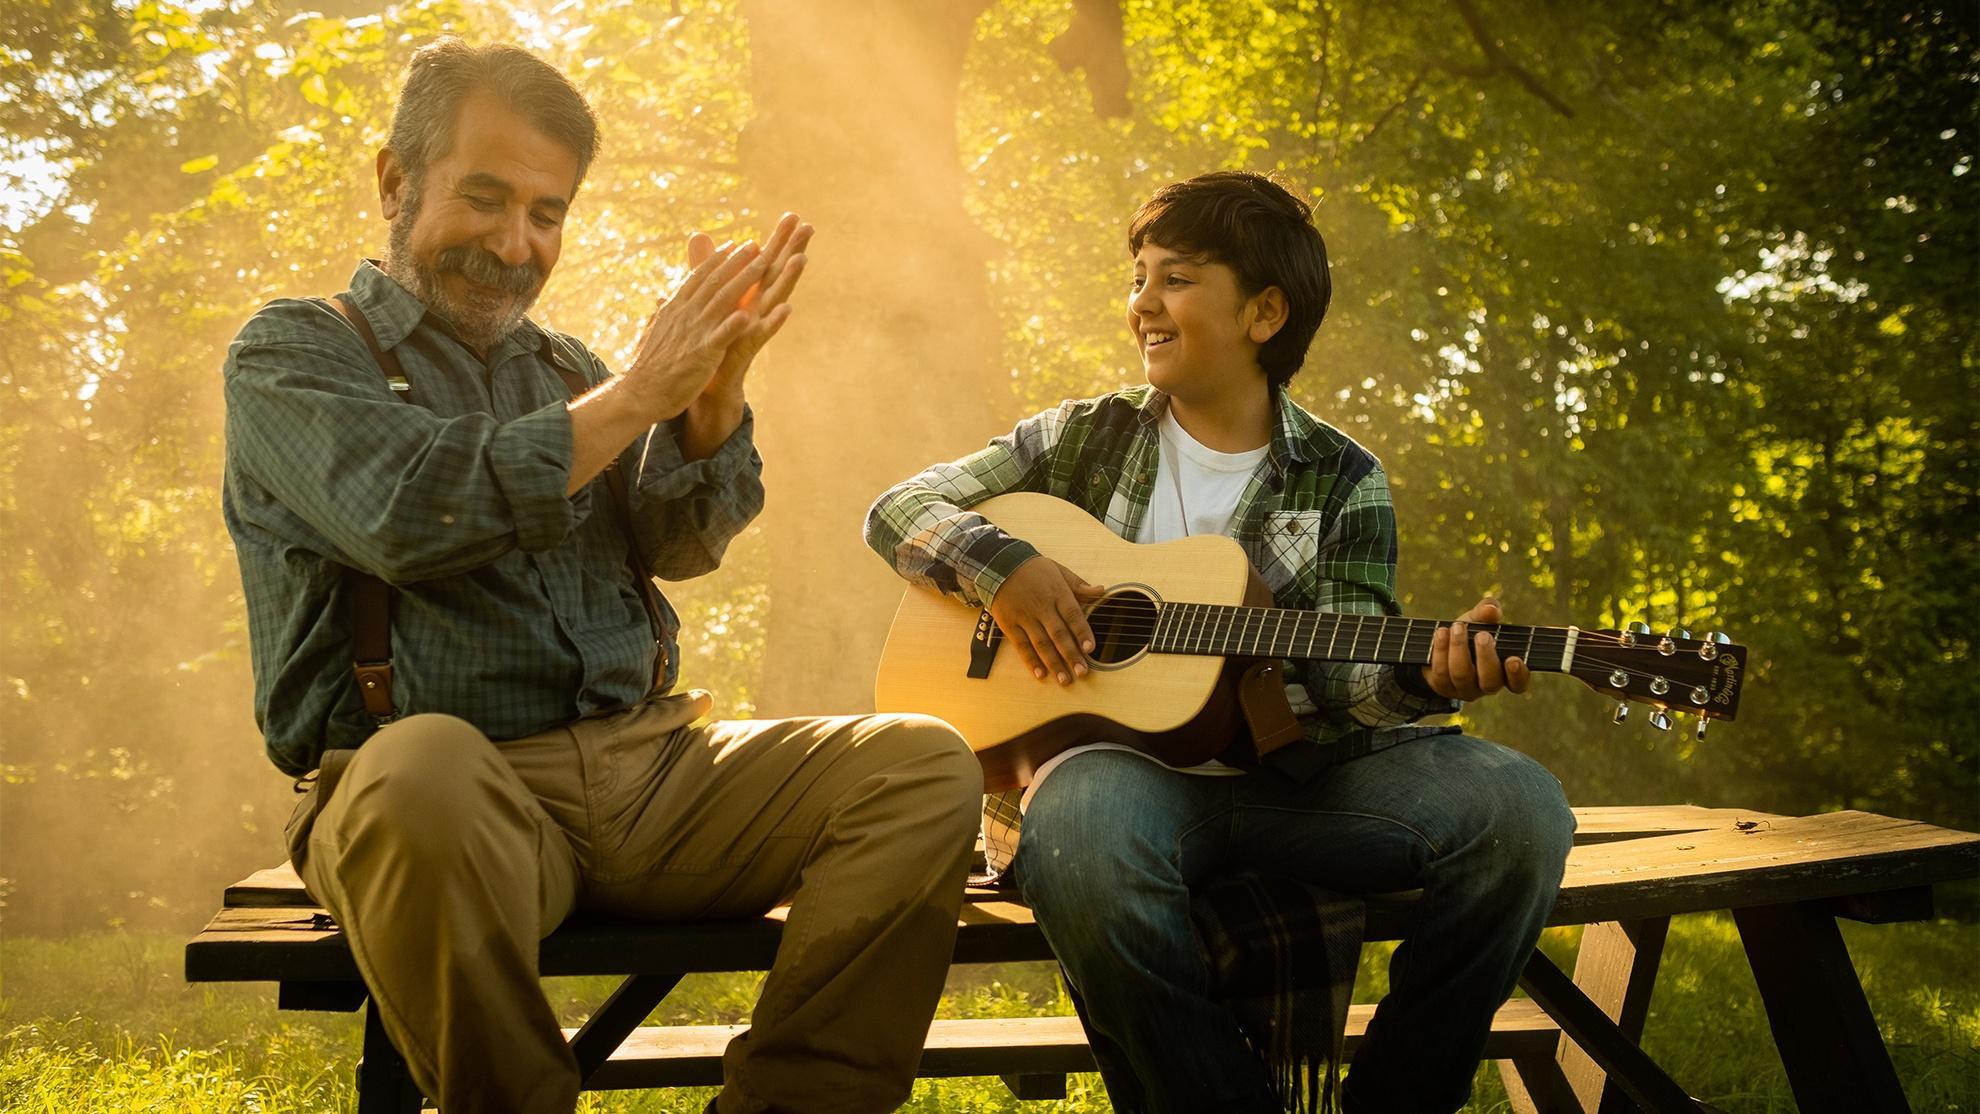 Grandfather teaches guitar to grandson